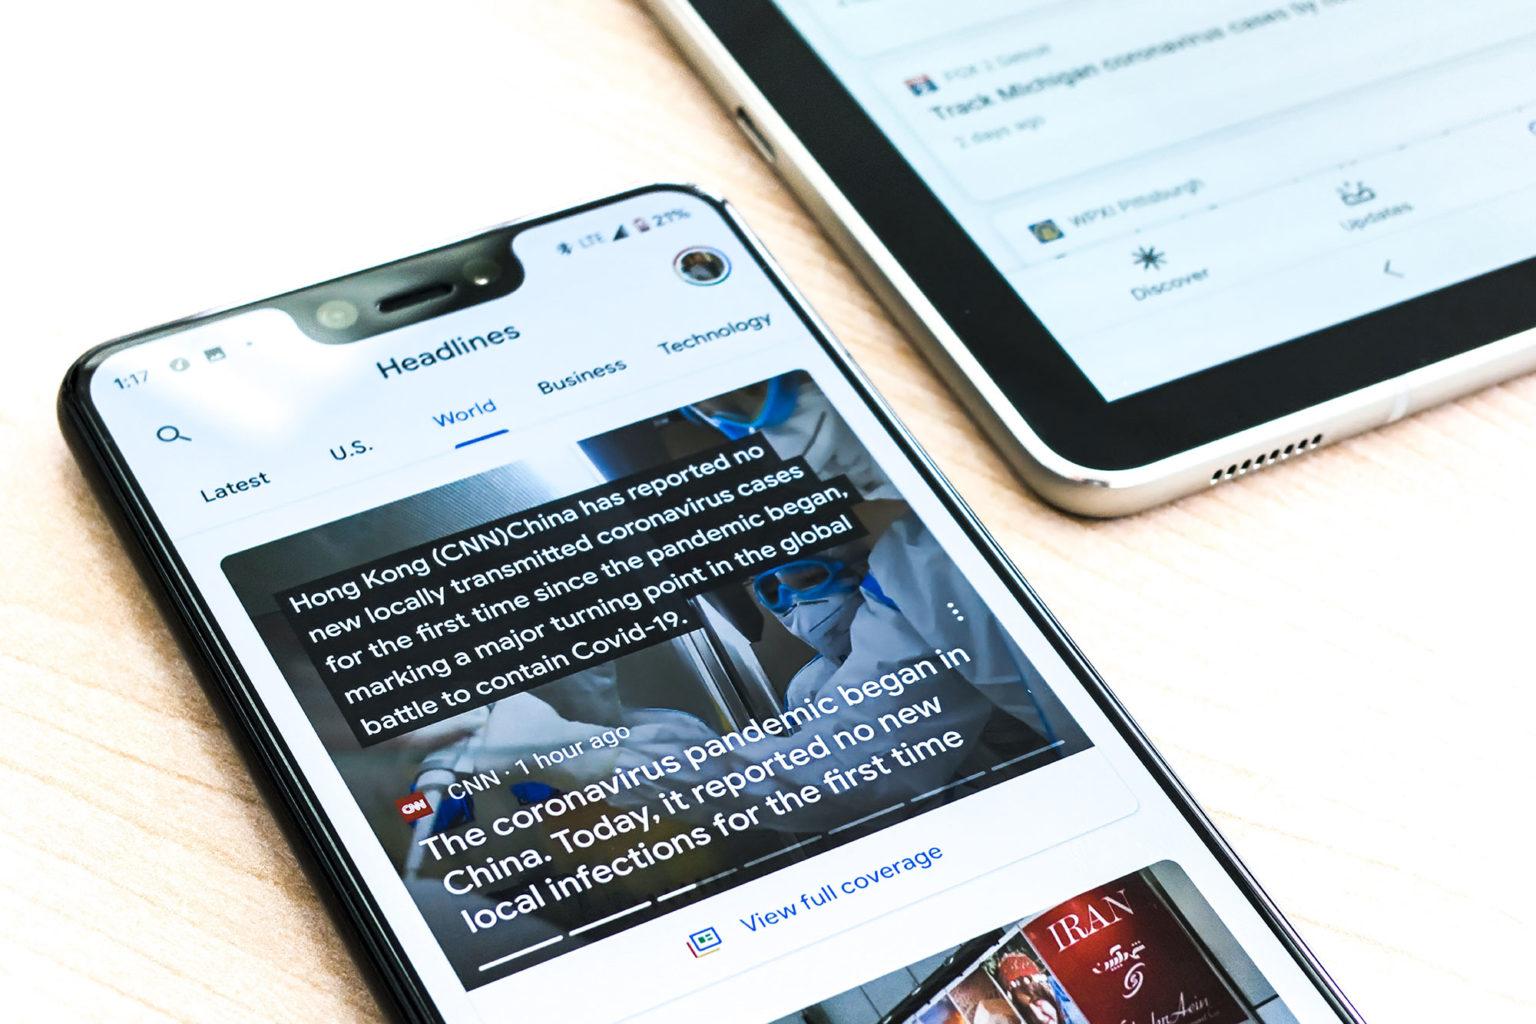 A smartphone displays a news website